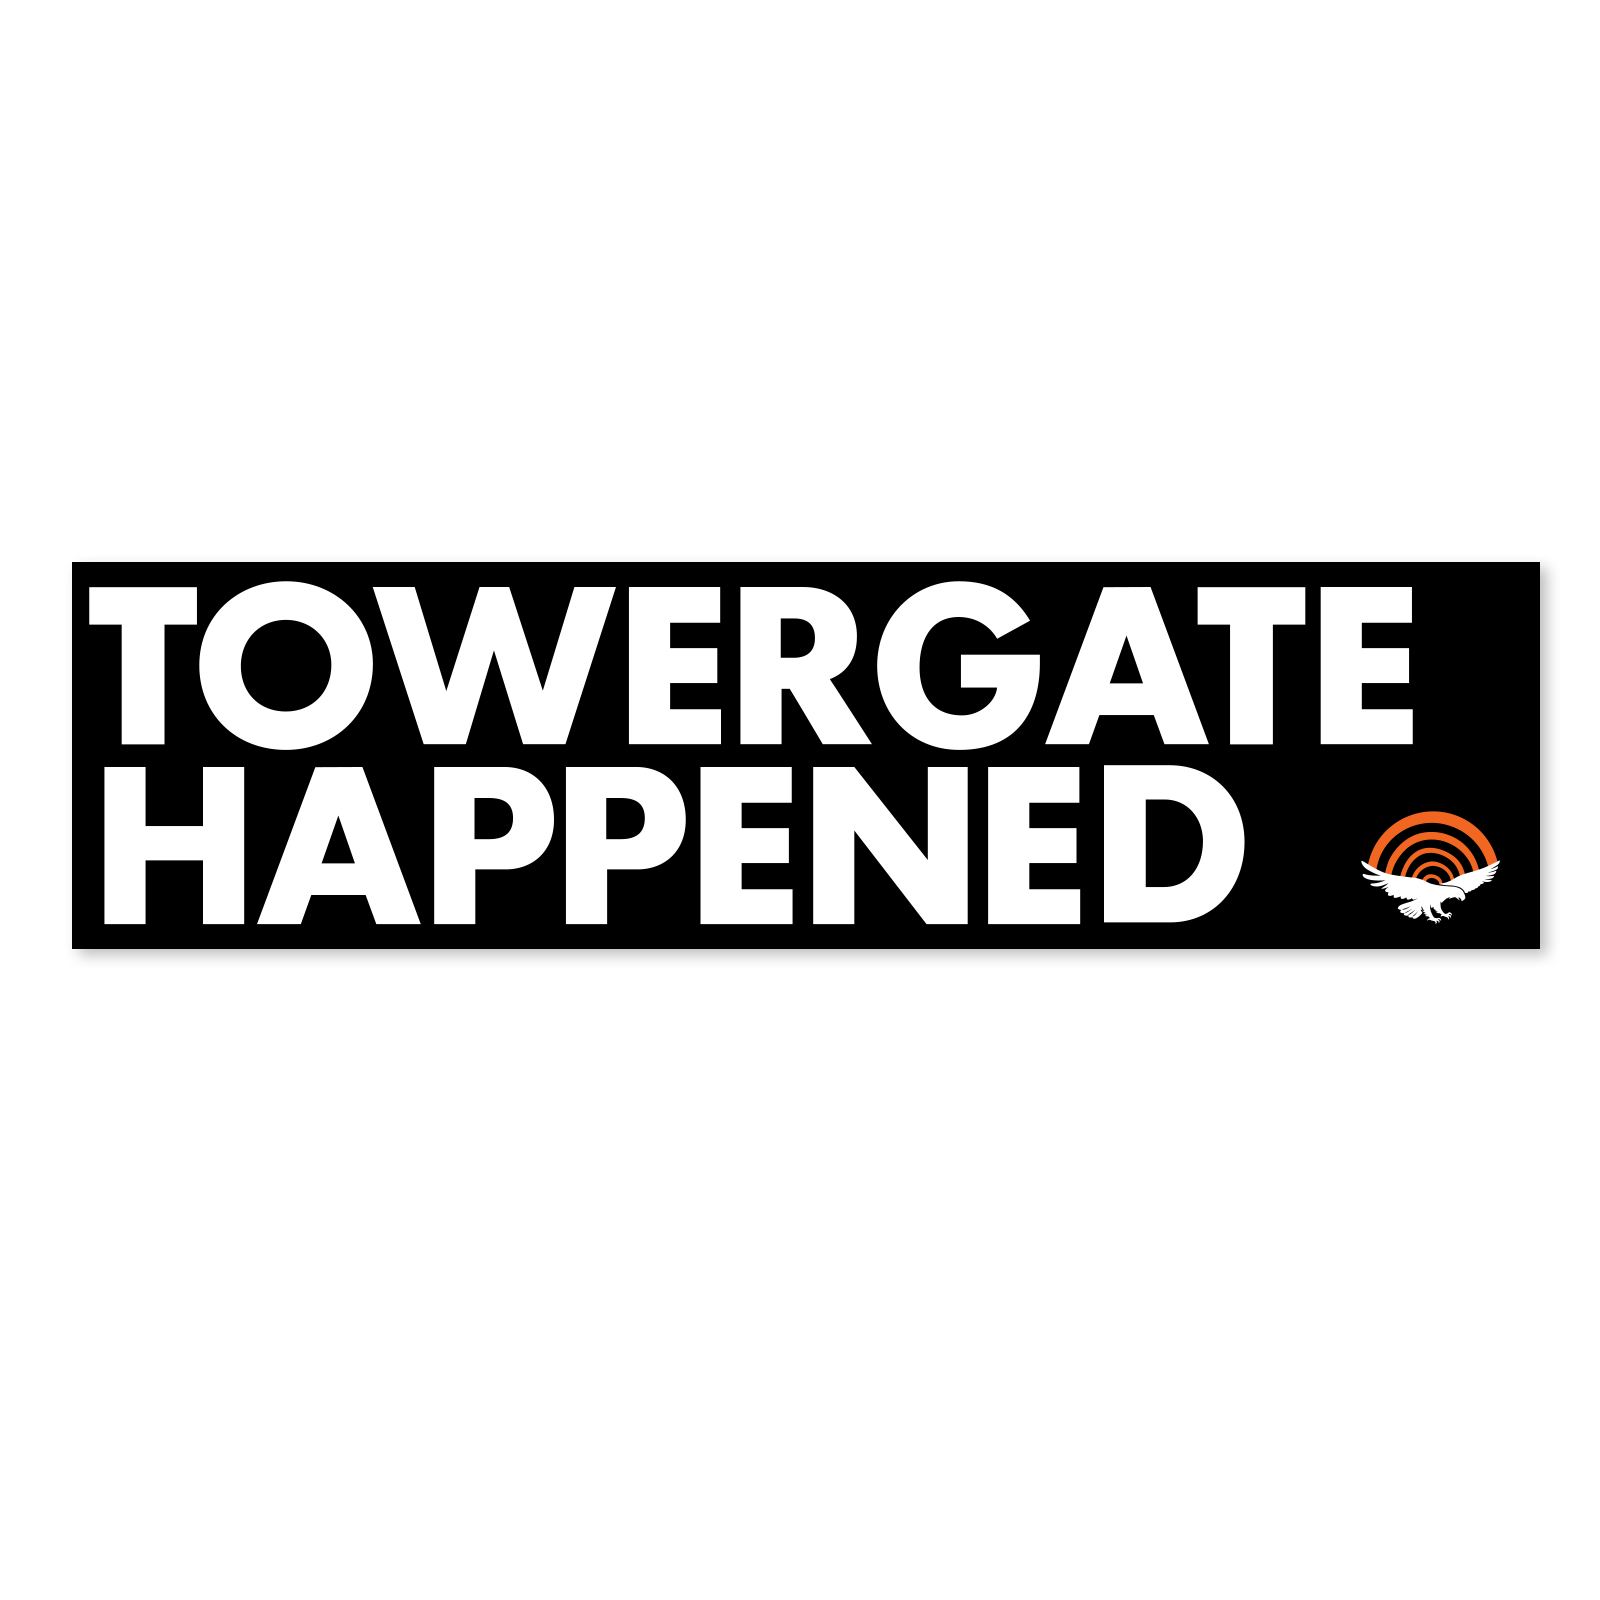 Towergate Happened Sticker